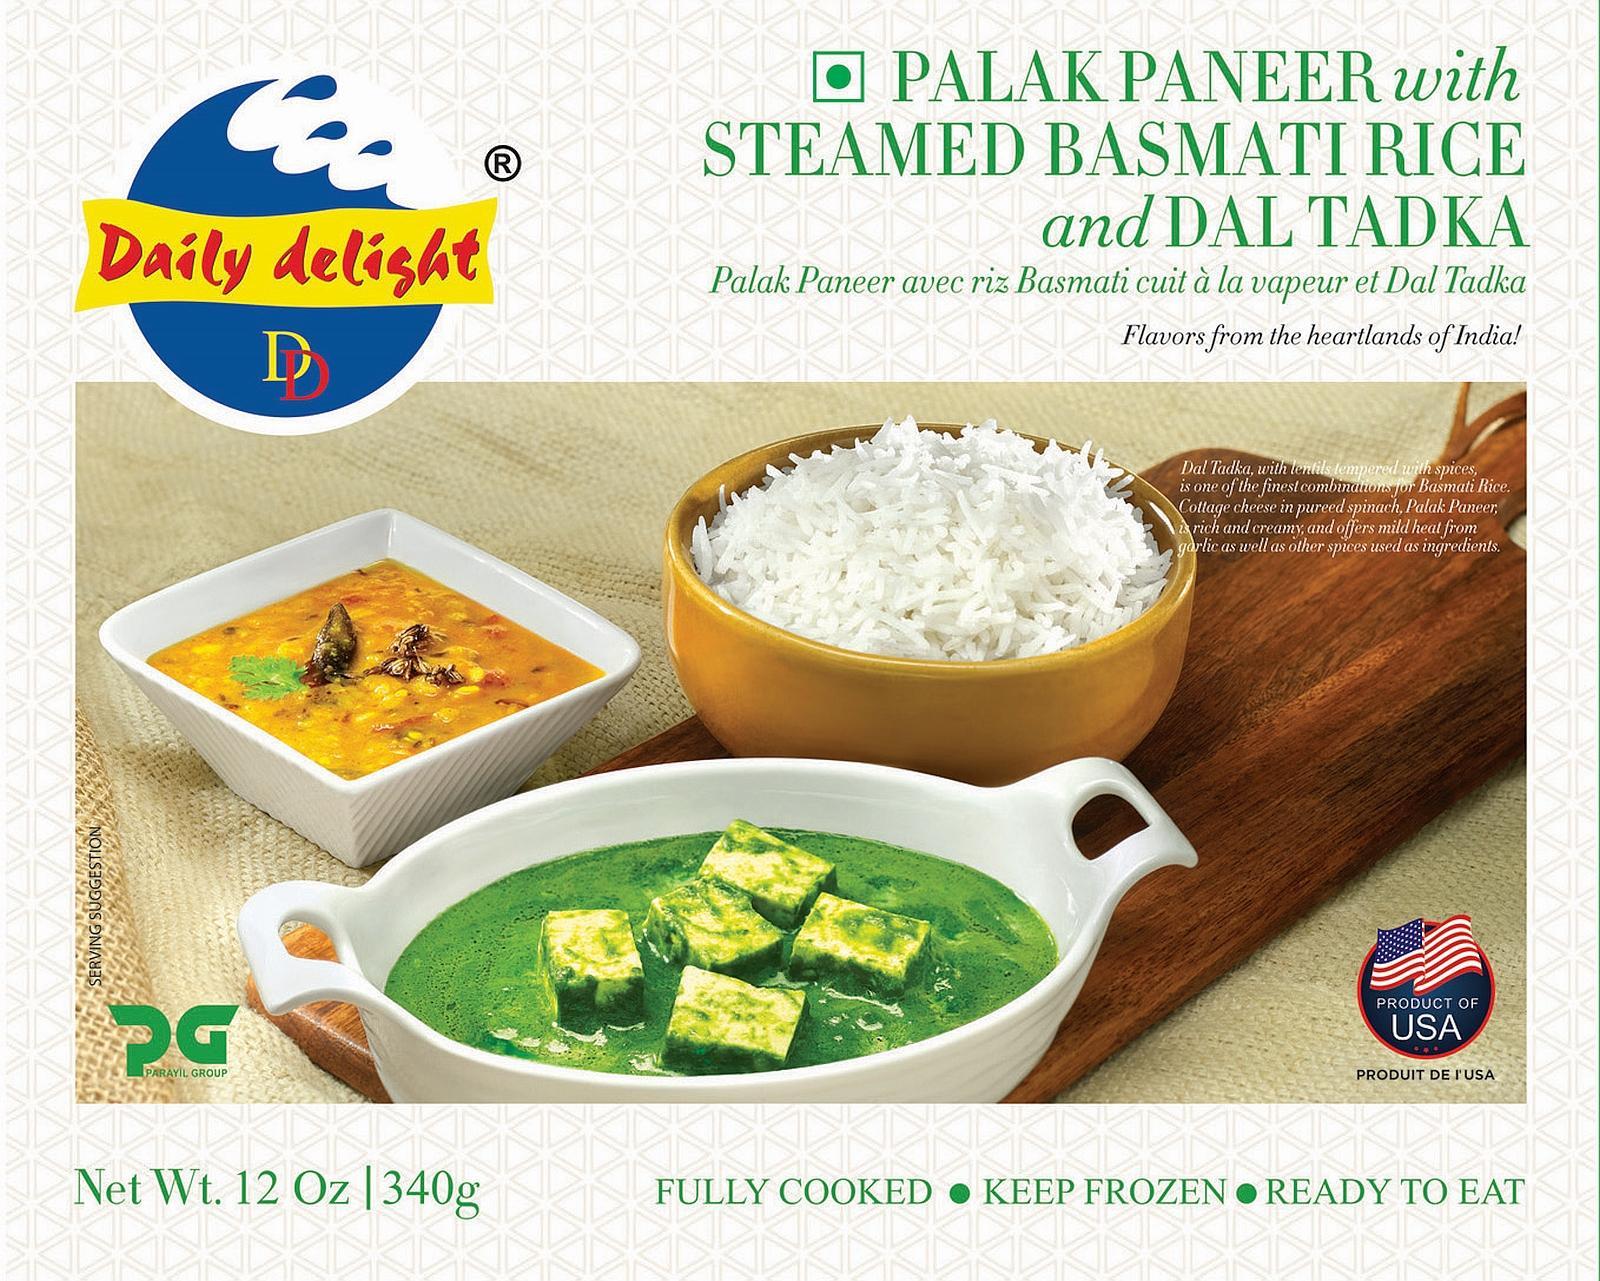 Daily Delight Palak Paneer with Steamed Basmati Rice and Dal Tadka